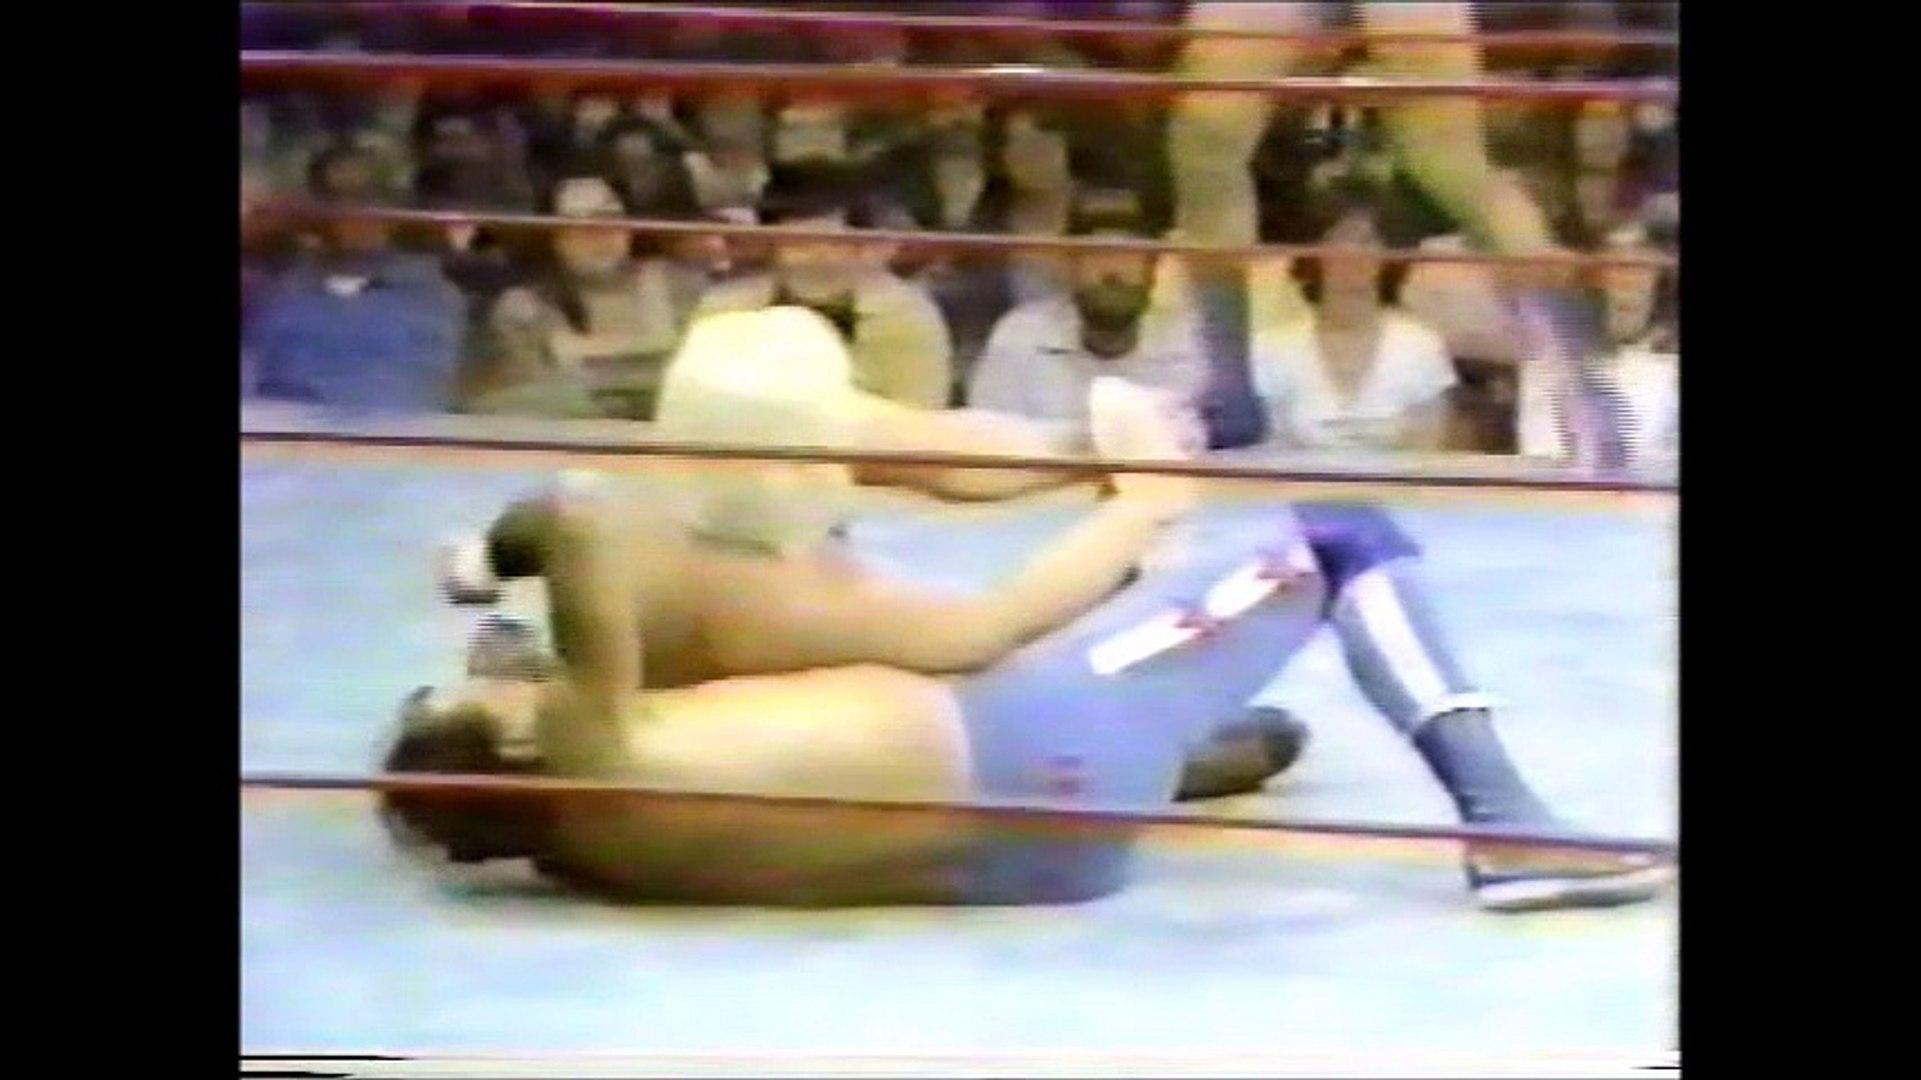 Buddy Rose/Sheepherders vs Roddy Piper/Rick Martel/Dutch Savage (Portland 1980)